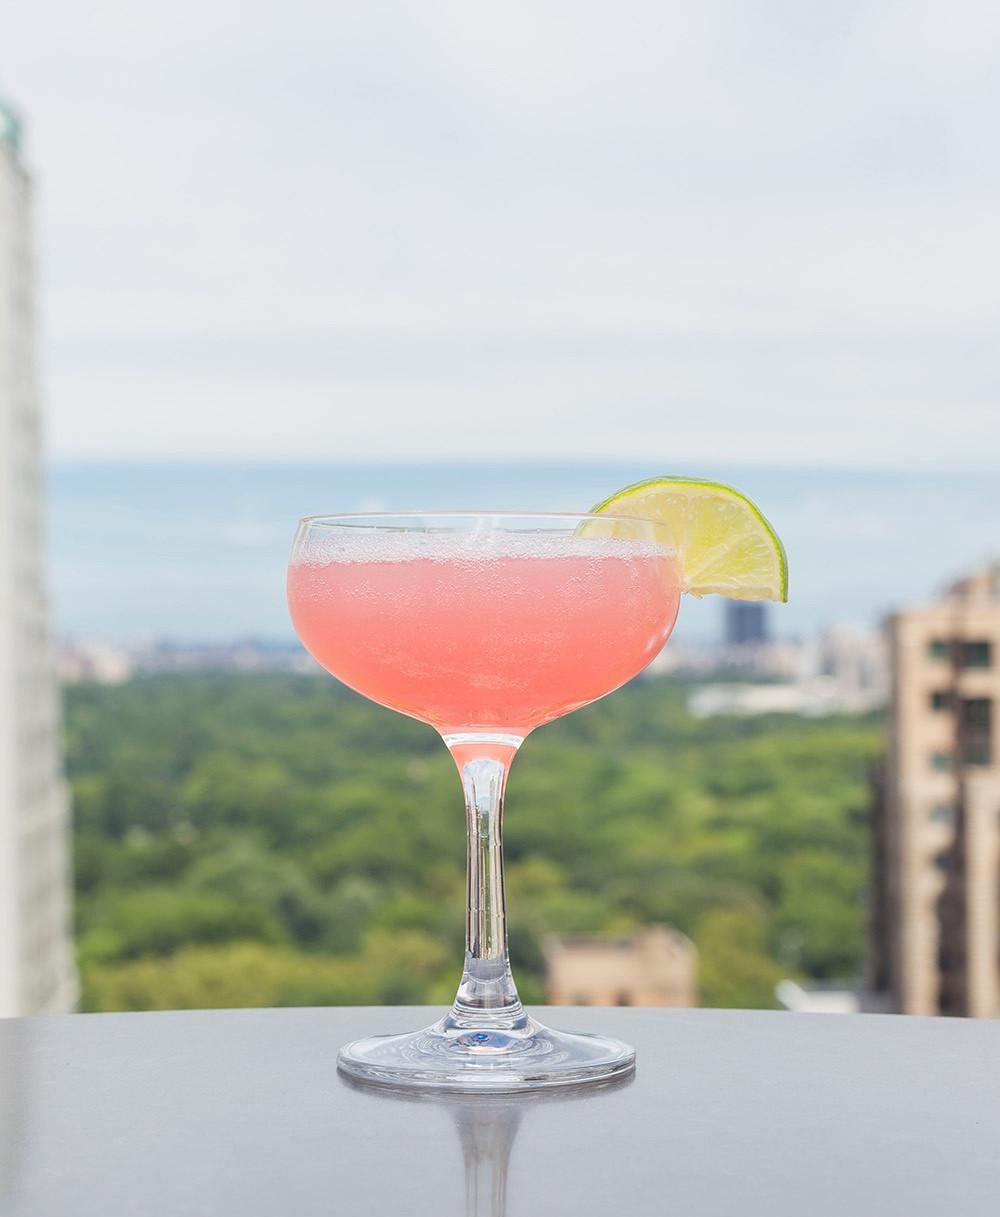 Vodka Drinks Mixers  Best Cosmopolitan Recipe How to Make a Cosmopolitan Delish